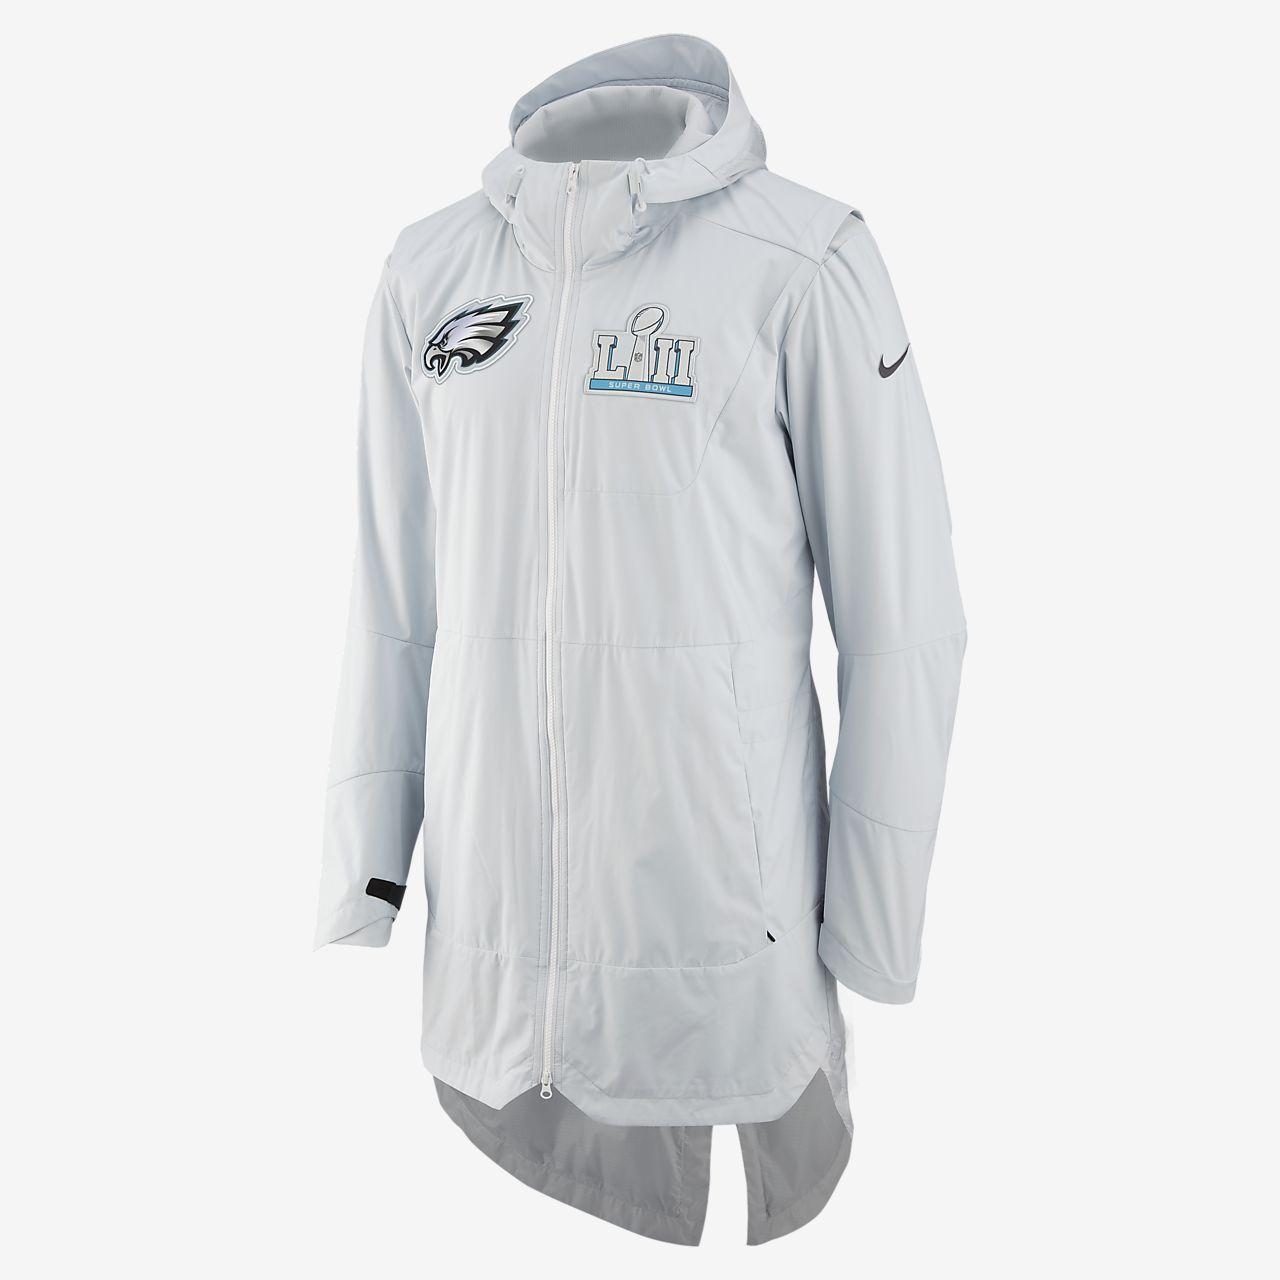 new arrival 1f401 ef688 SBLII Nike Player Cape (NFL Eagles) Men's Jacket | Super ...